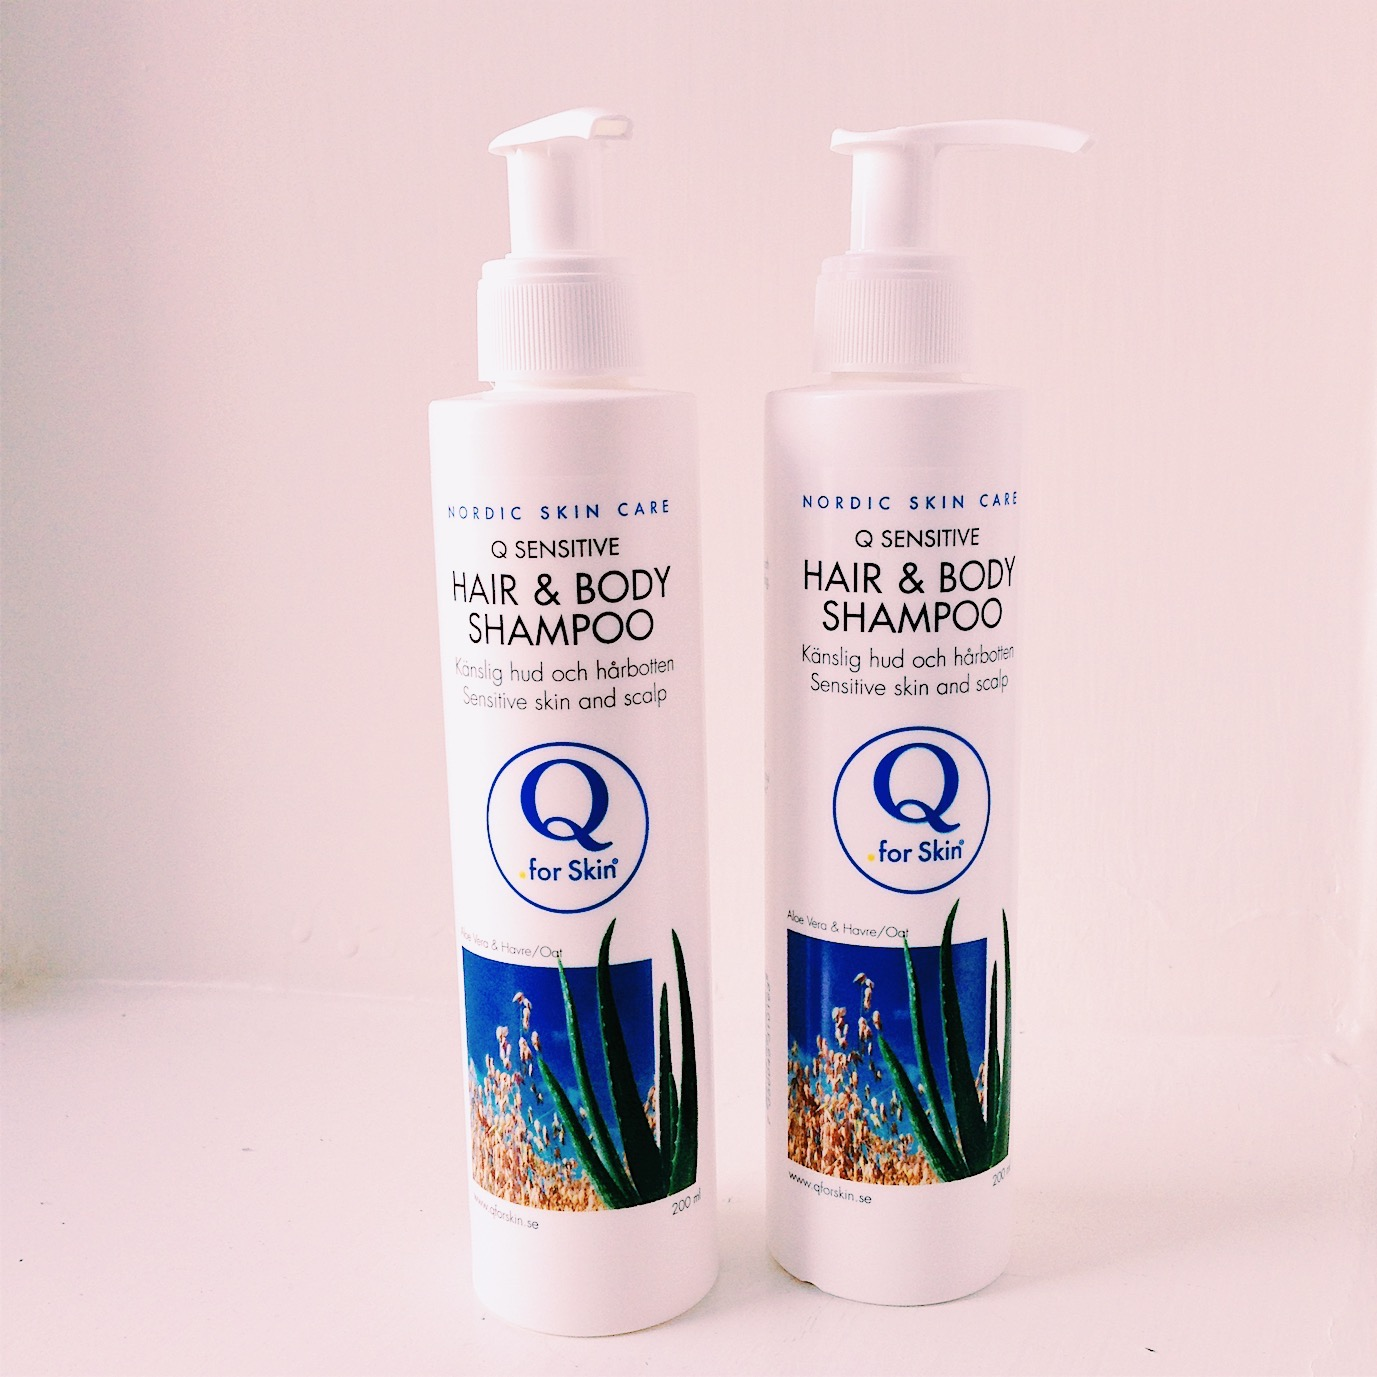 Schampo - Q for Skin